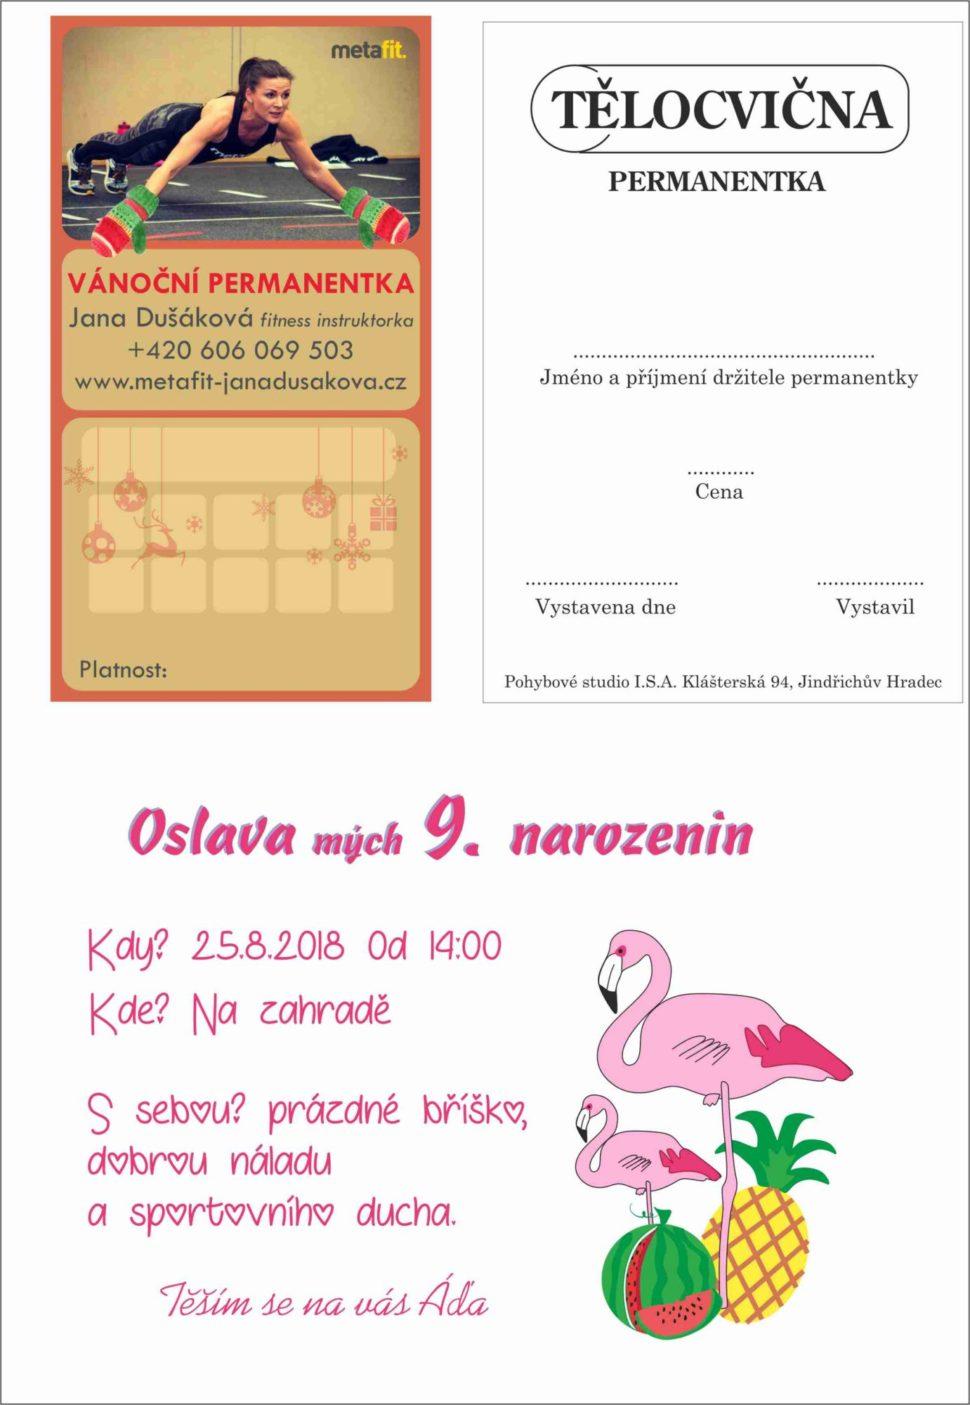 permanentka-pozvánka